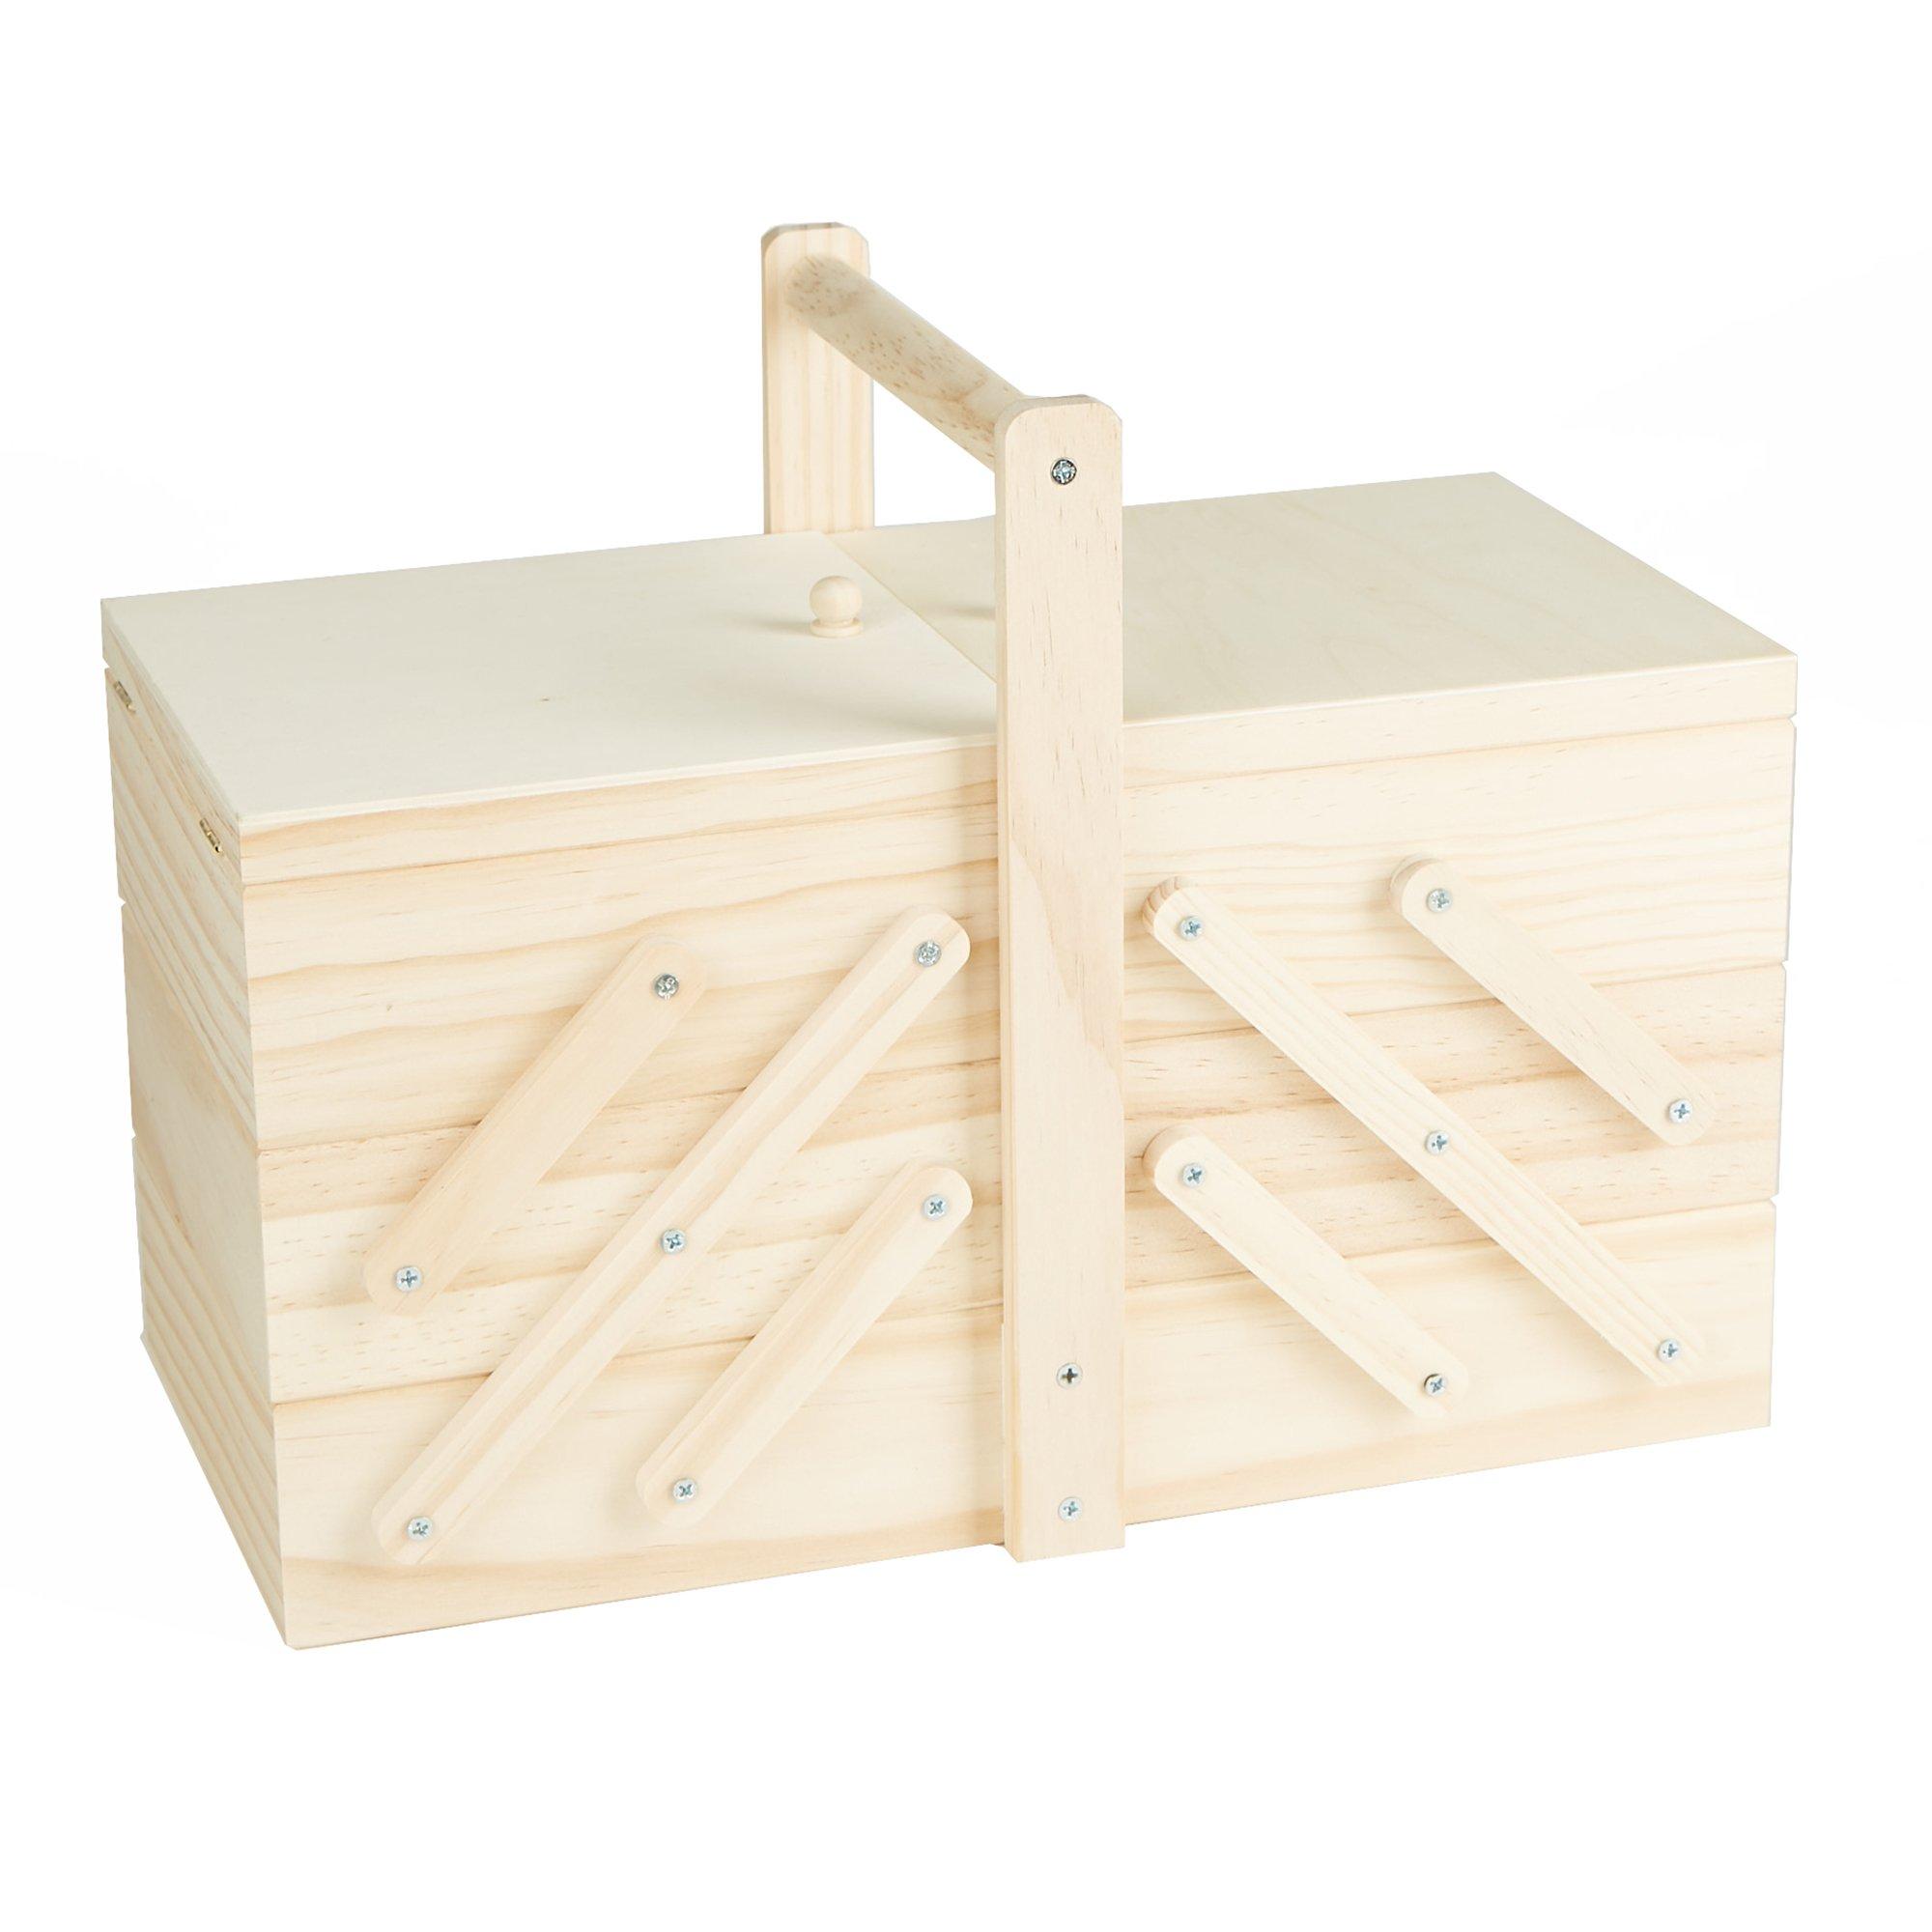 Mind Reader WSEWBOX-BRN Sewing Box Organizer, Needles, Thread, Scissors, Wood, Brown